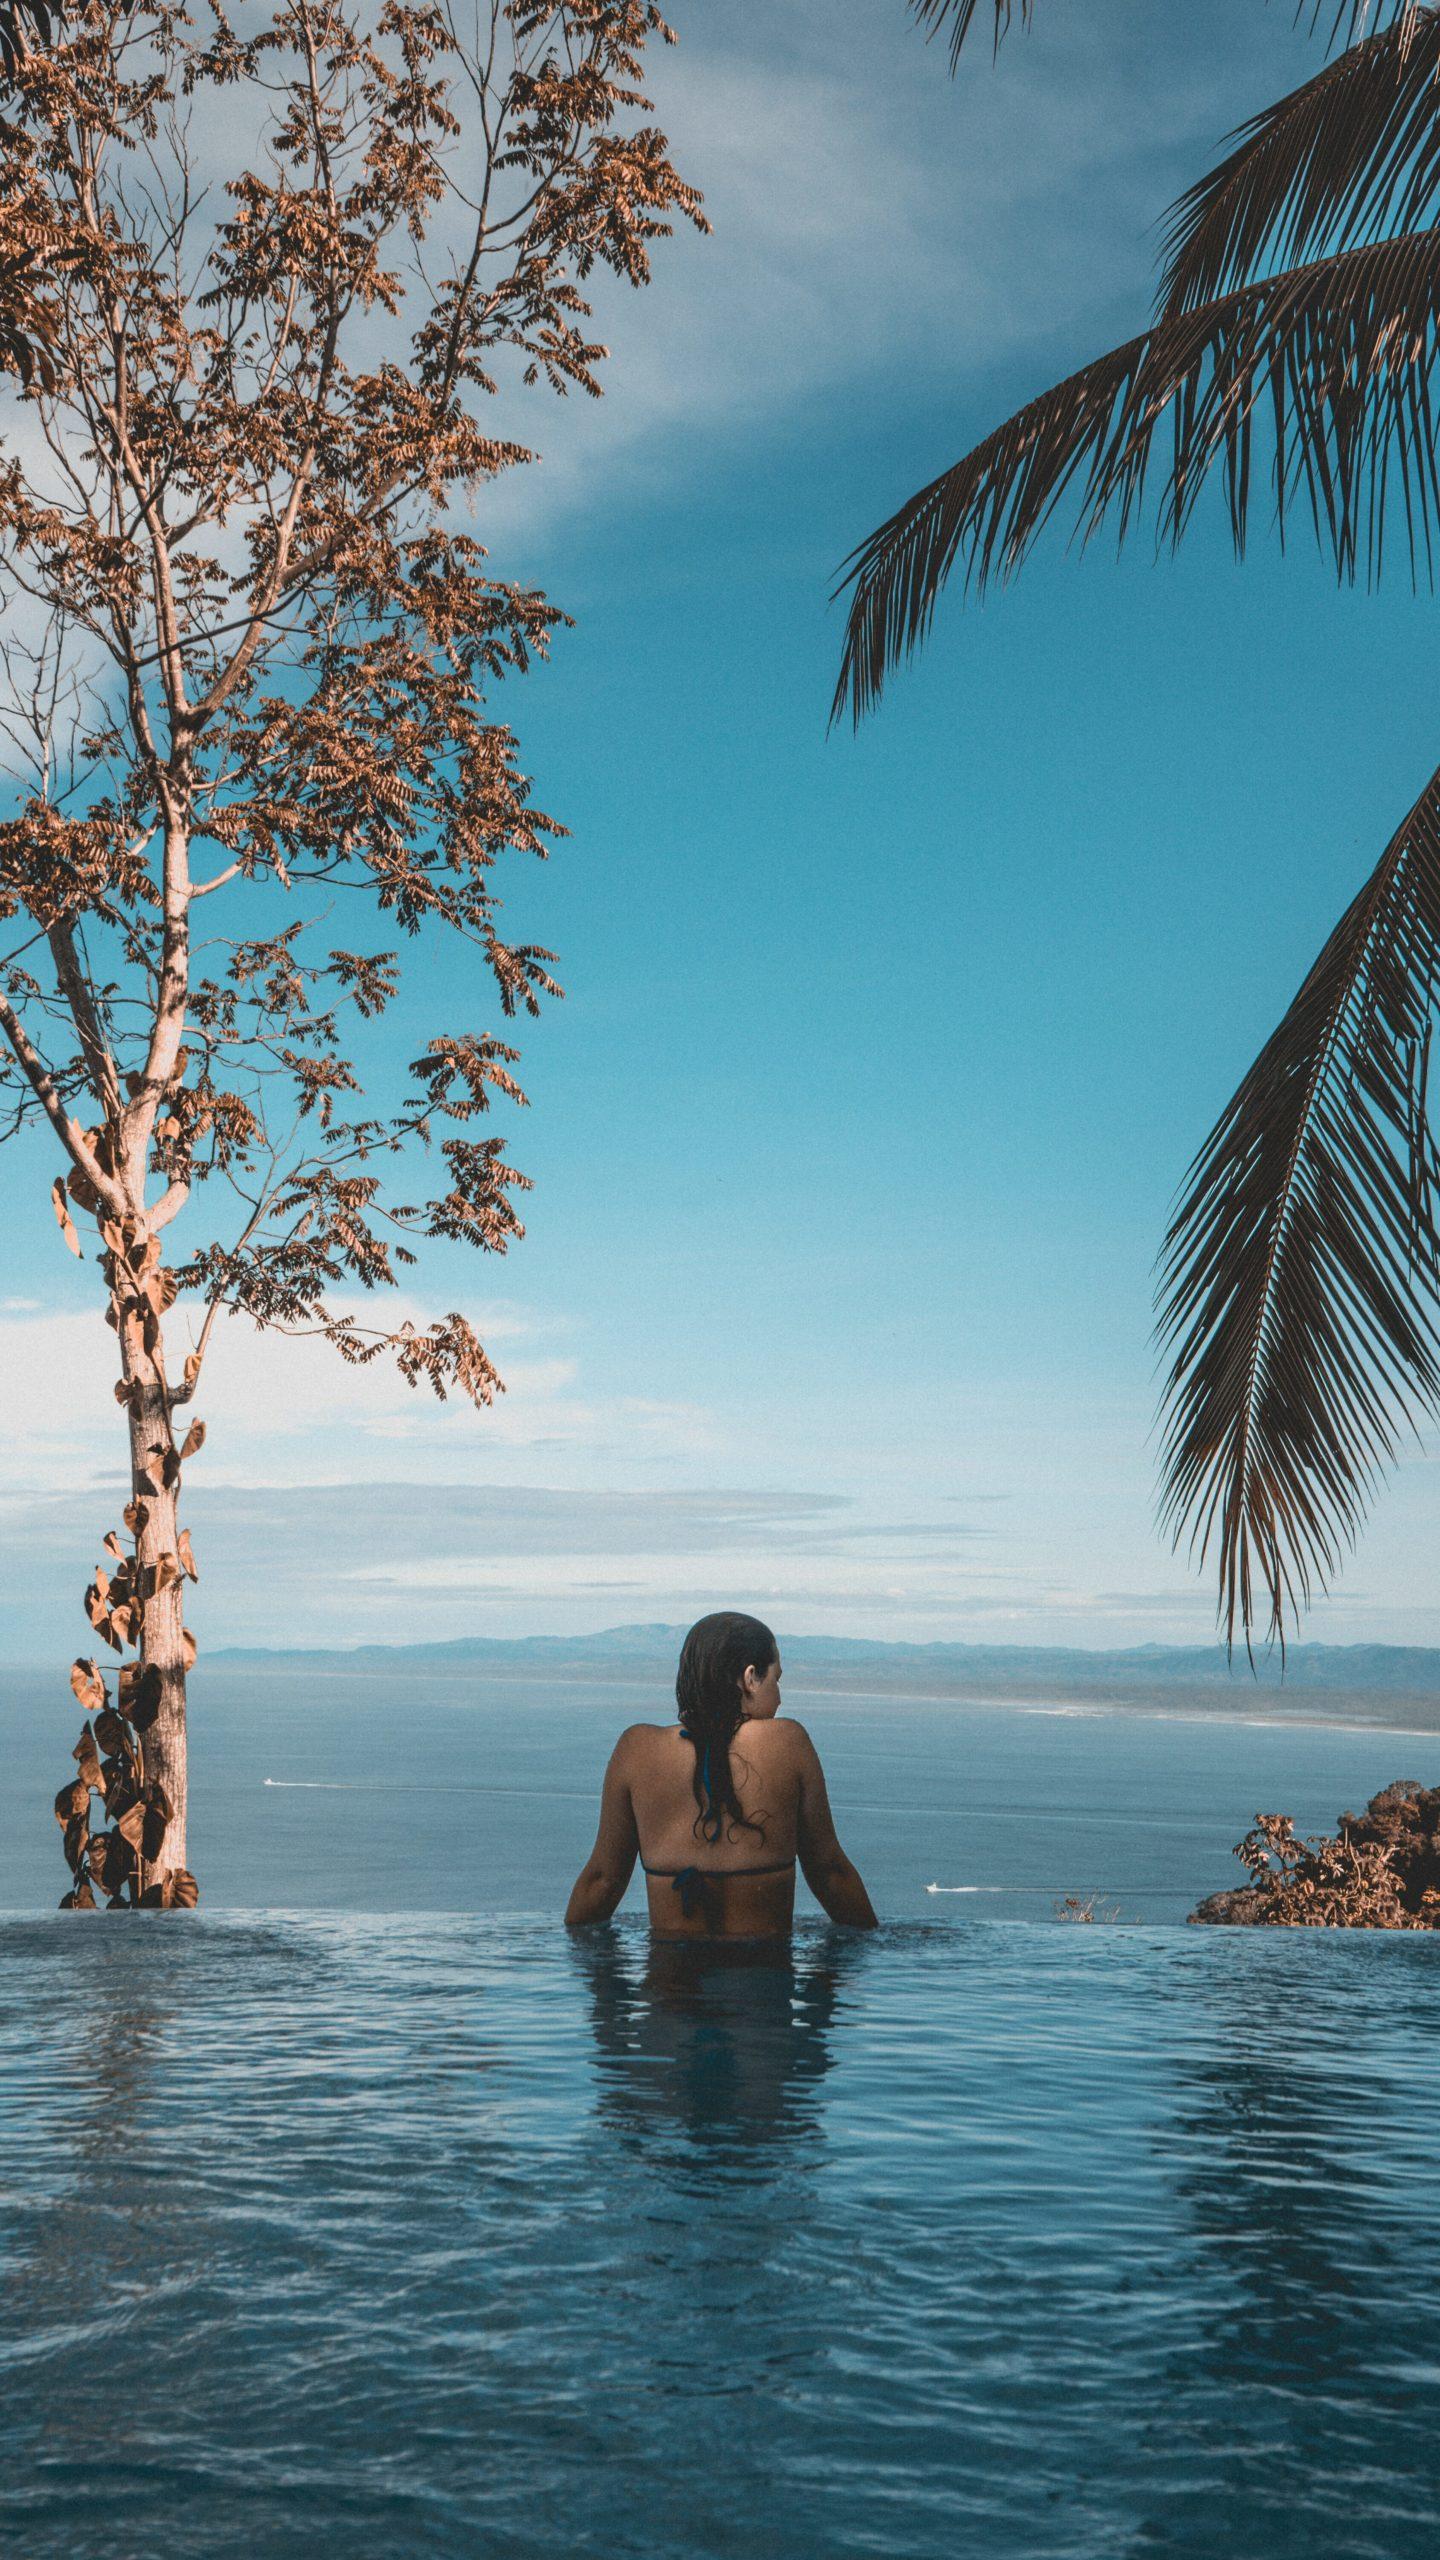 Travel Influencers on Instagram (Top Picks)